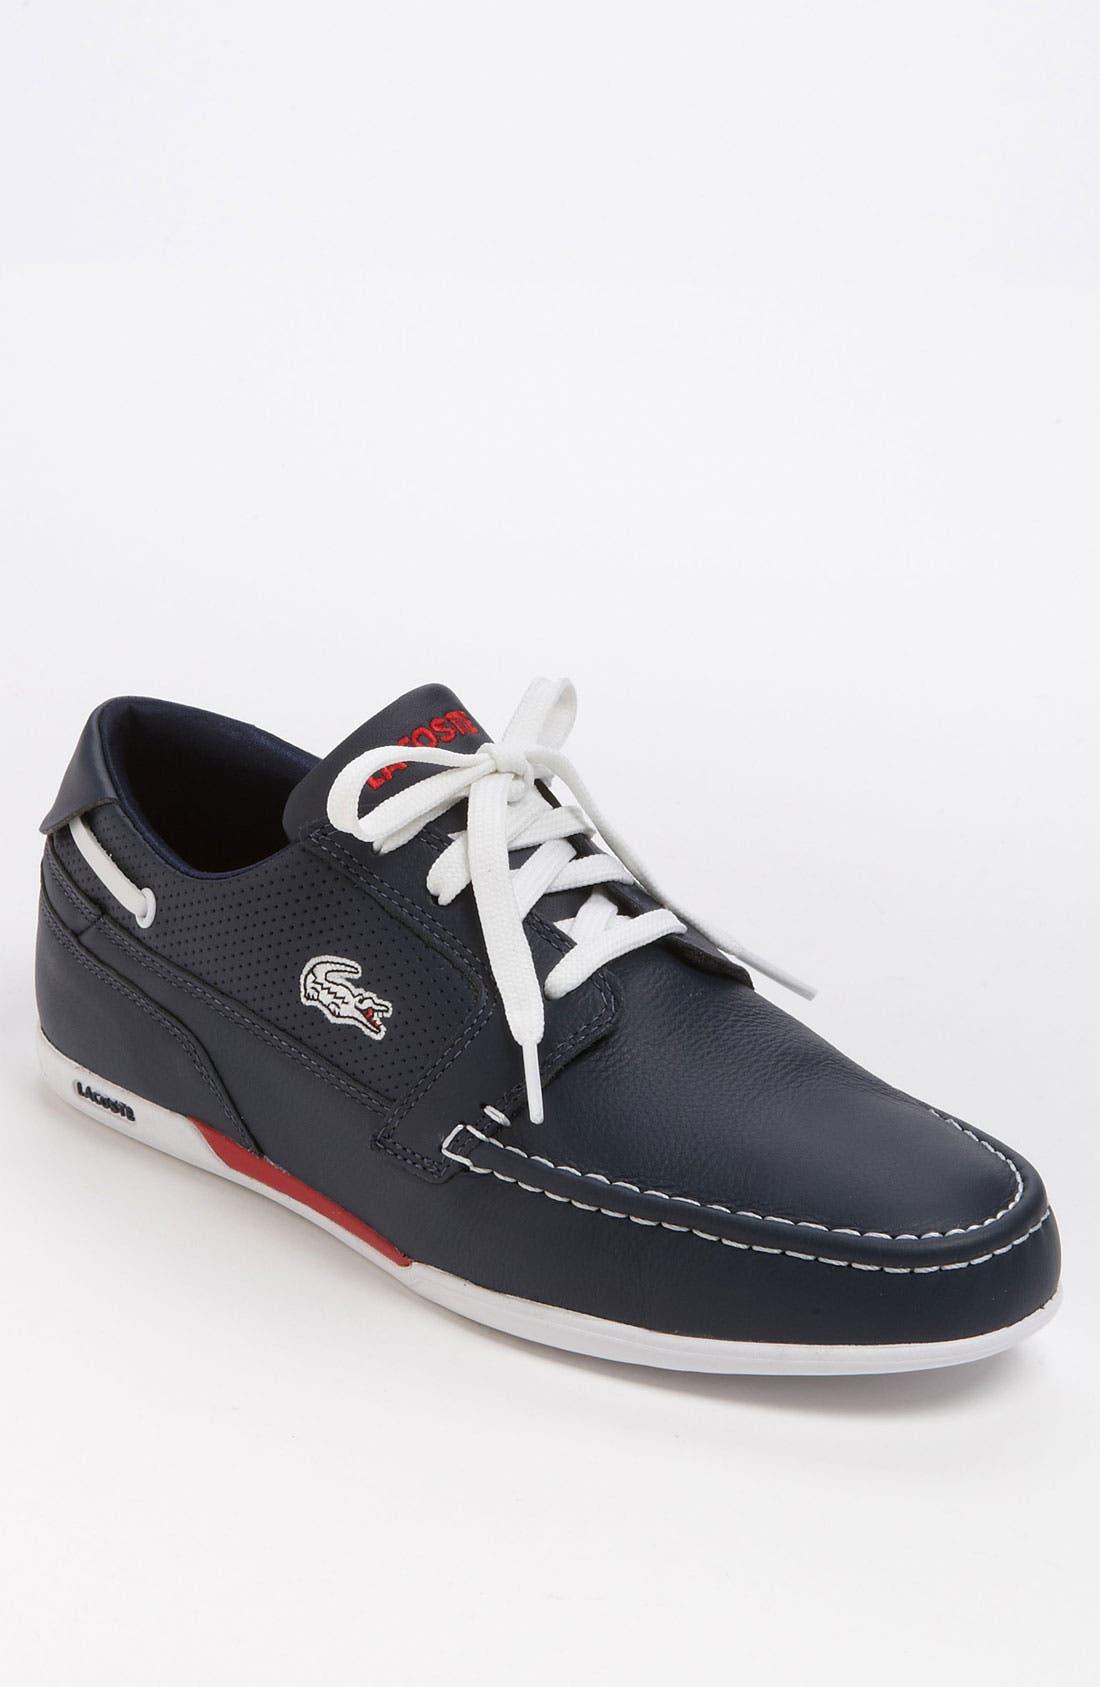 Alternate Image 1 Selected - Lacoste 'Dreyfus' Sneaker